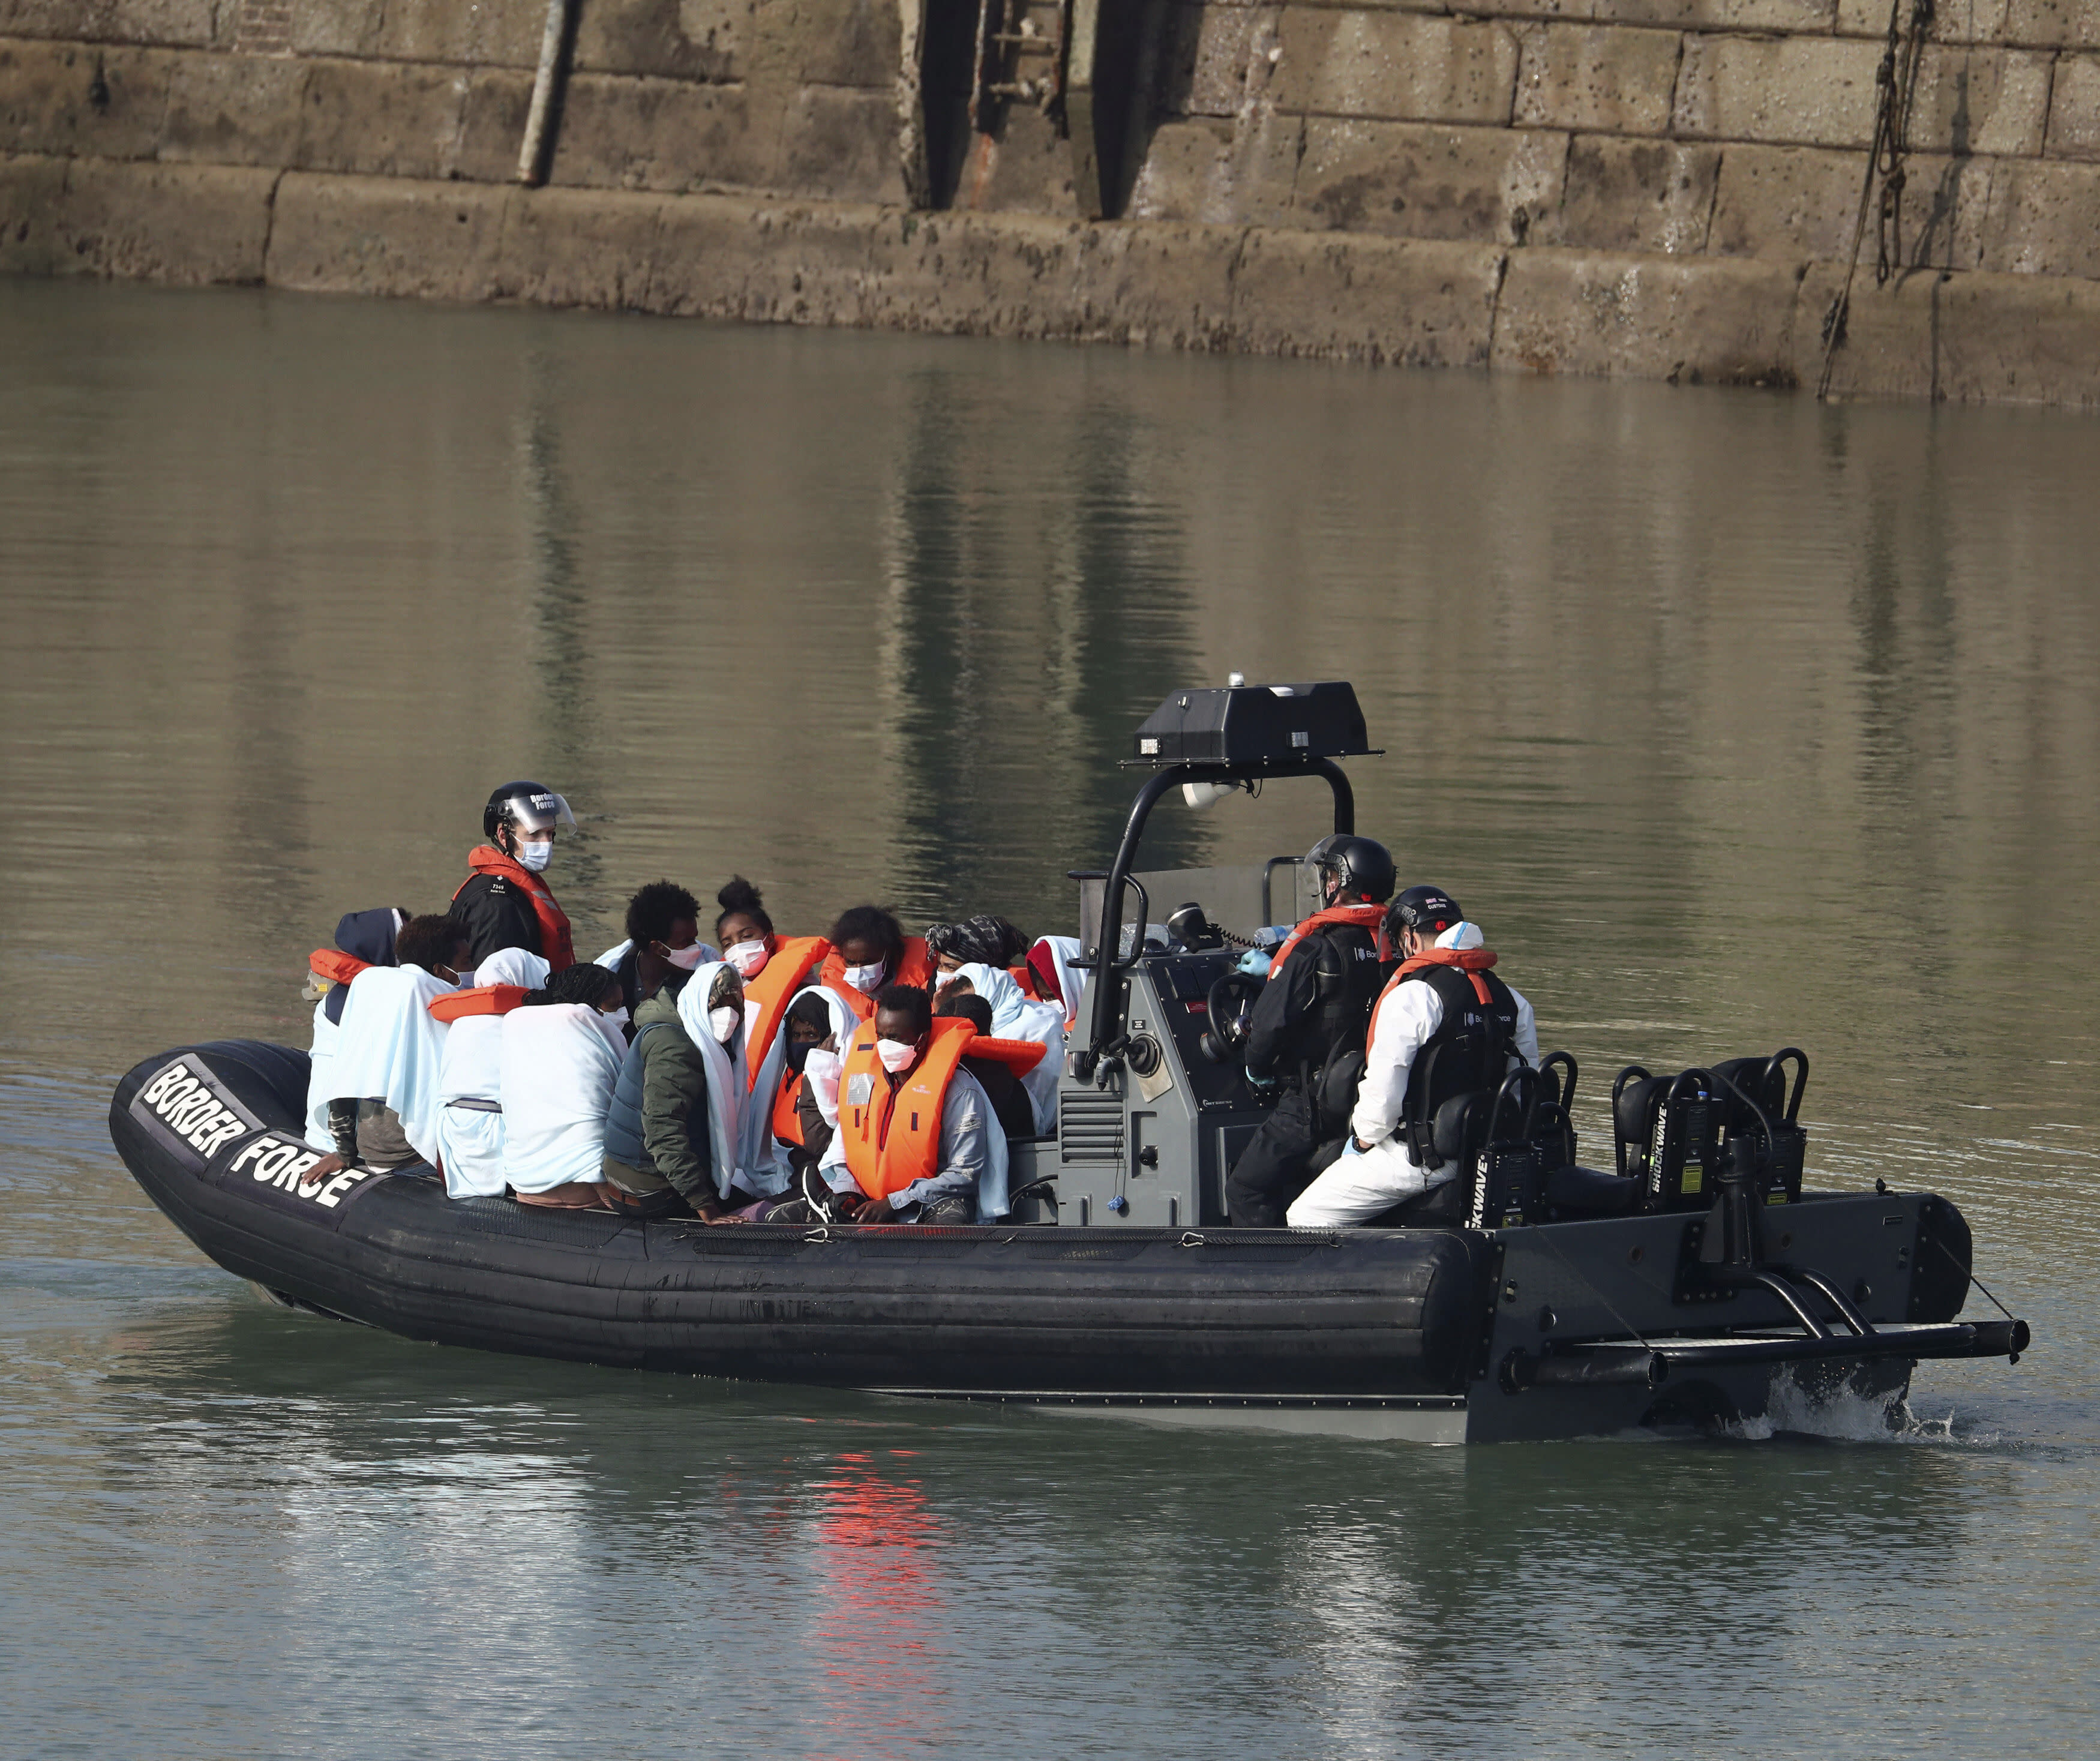 United Kingdom  mulled sending asylum-seekers to remote Atlantic island